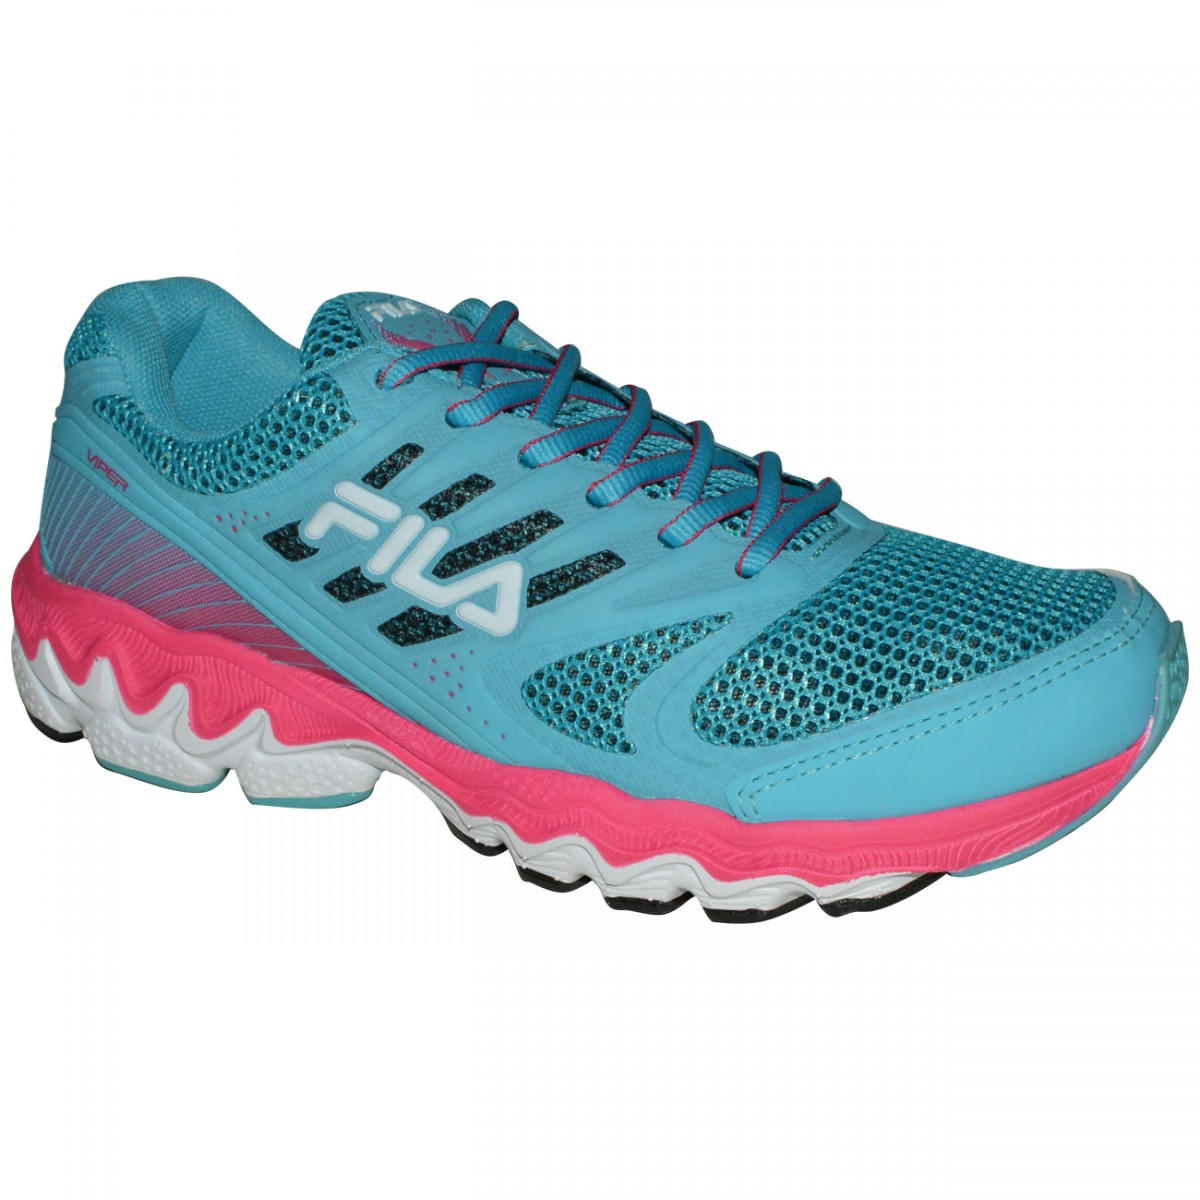 3d5cd9b6de4 Tenis Fila Viper 683139 - Celeste Pink - Chuteira Nike